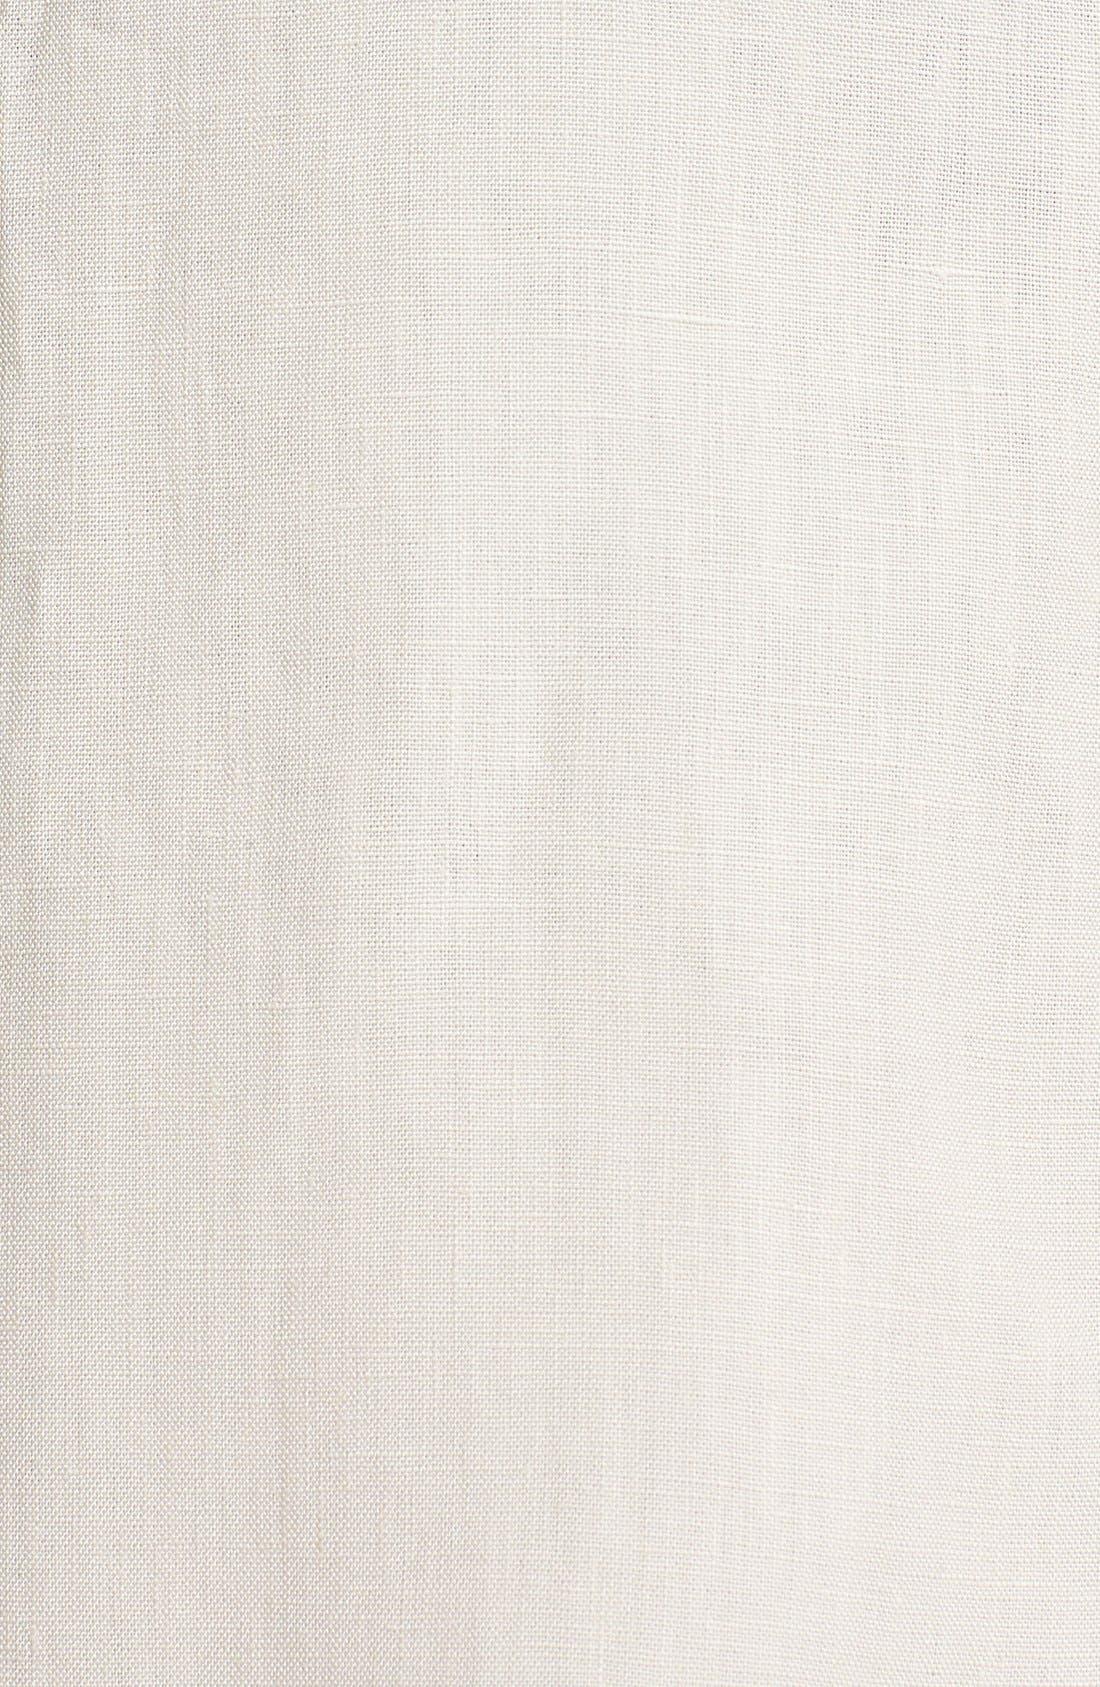 Alternate Image 4  - Max Mara 'Ghinea' One-Button Linen Jacket